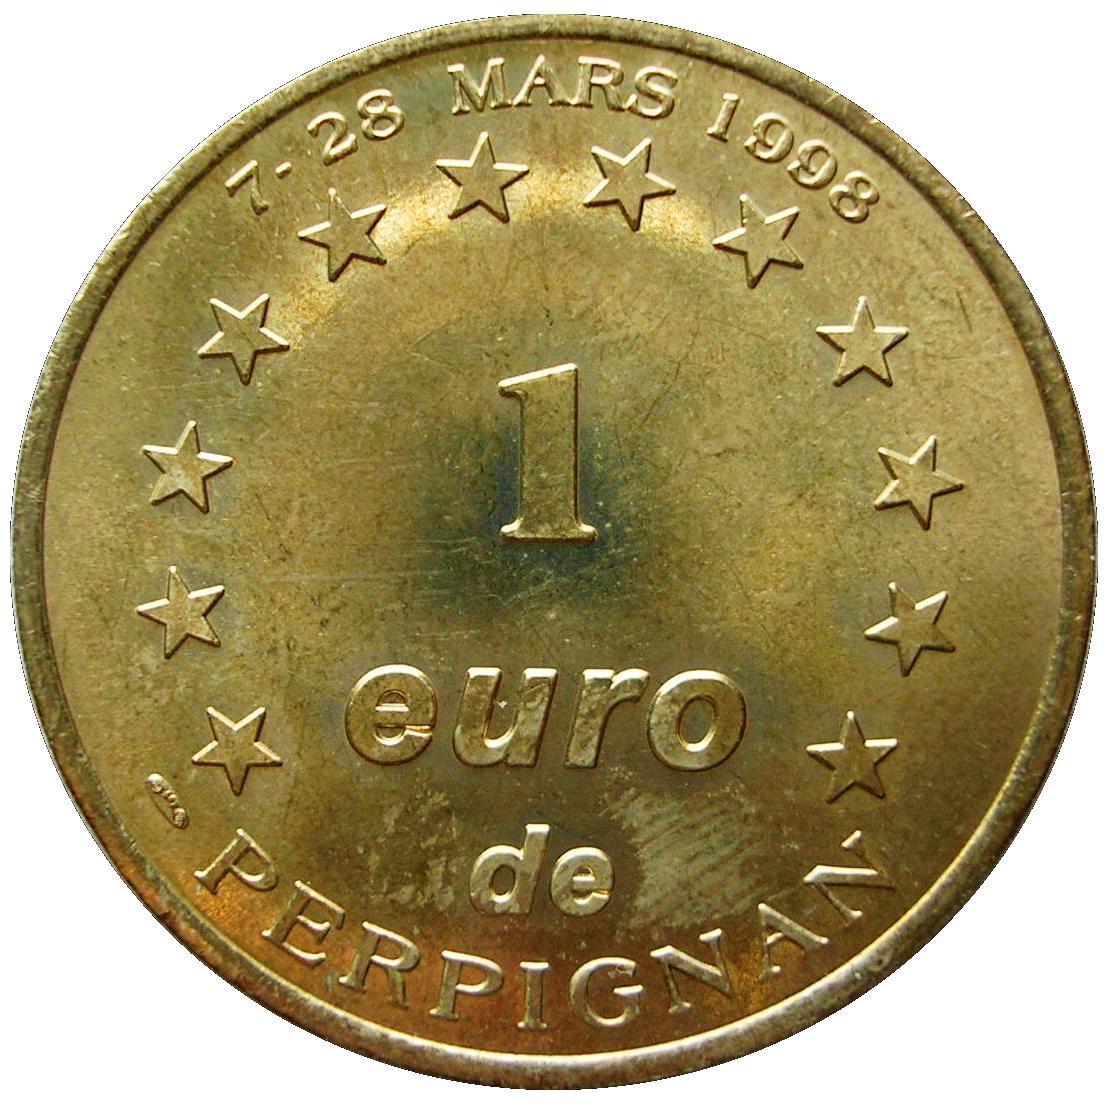 Coin 1 Euro - Perpignan France reverse